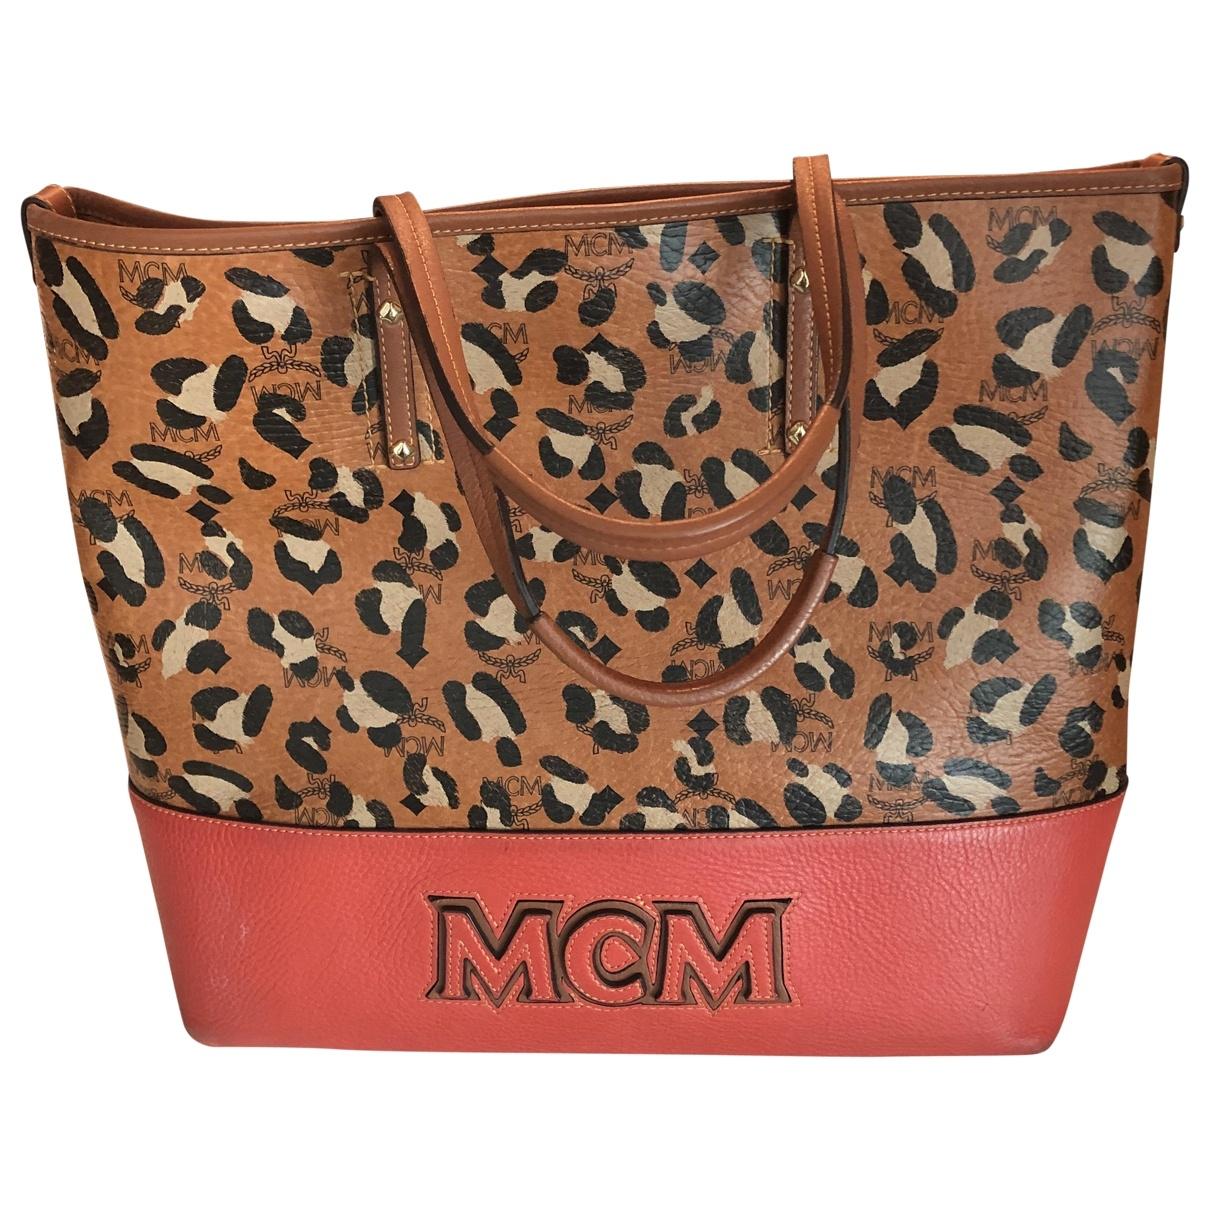 Mcm \N Red Leather handbag for Women \N